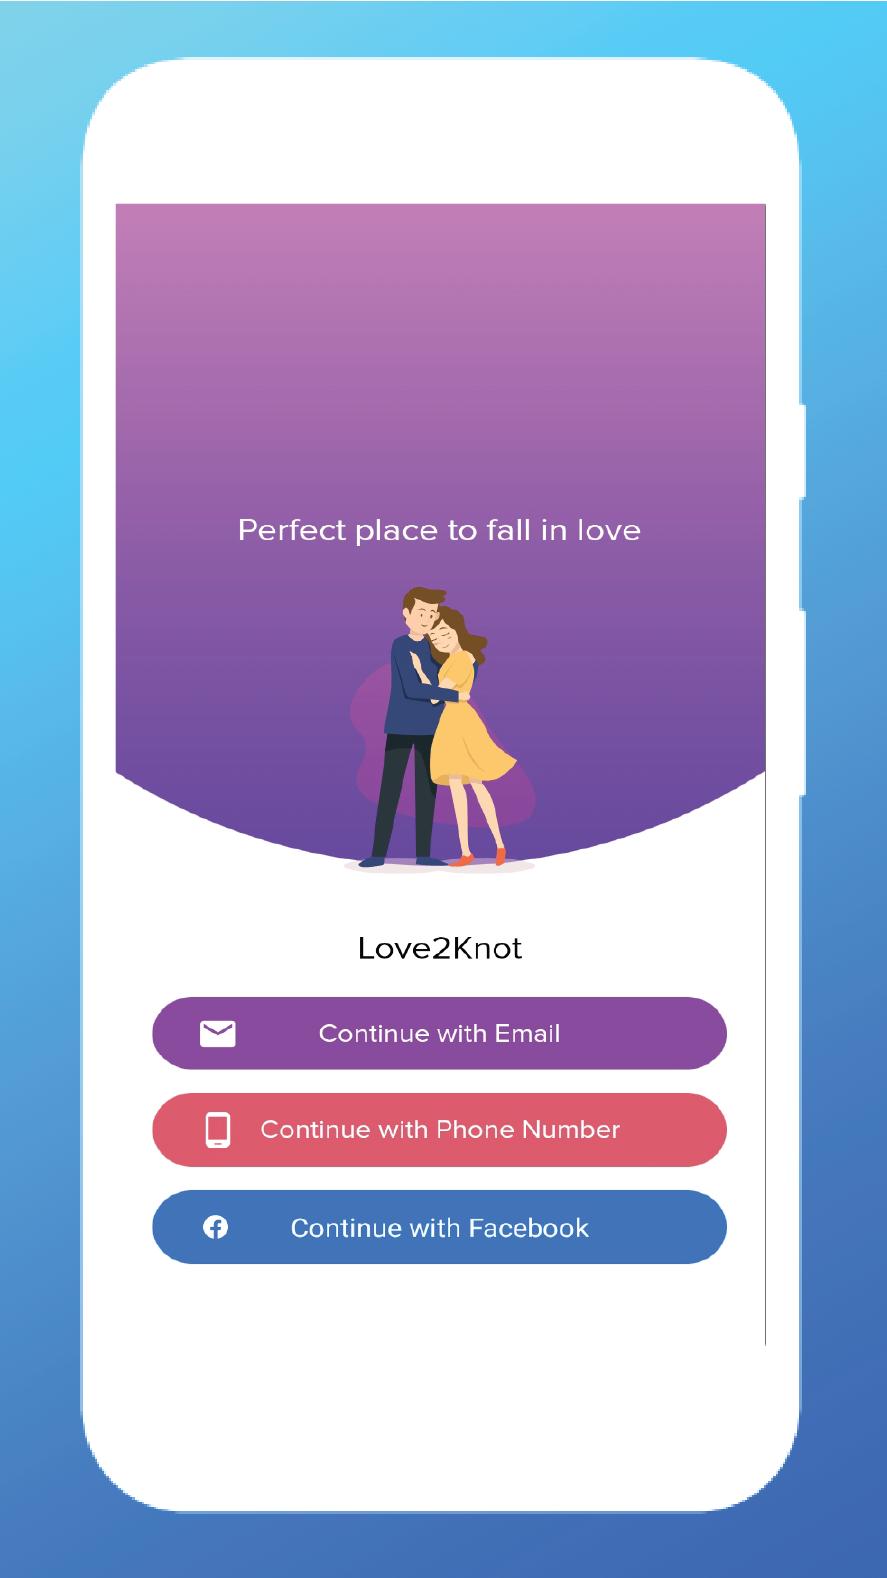 Love2Knot